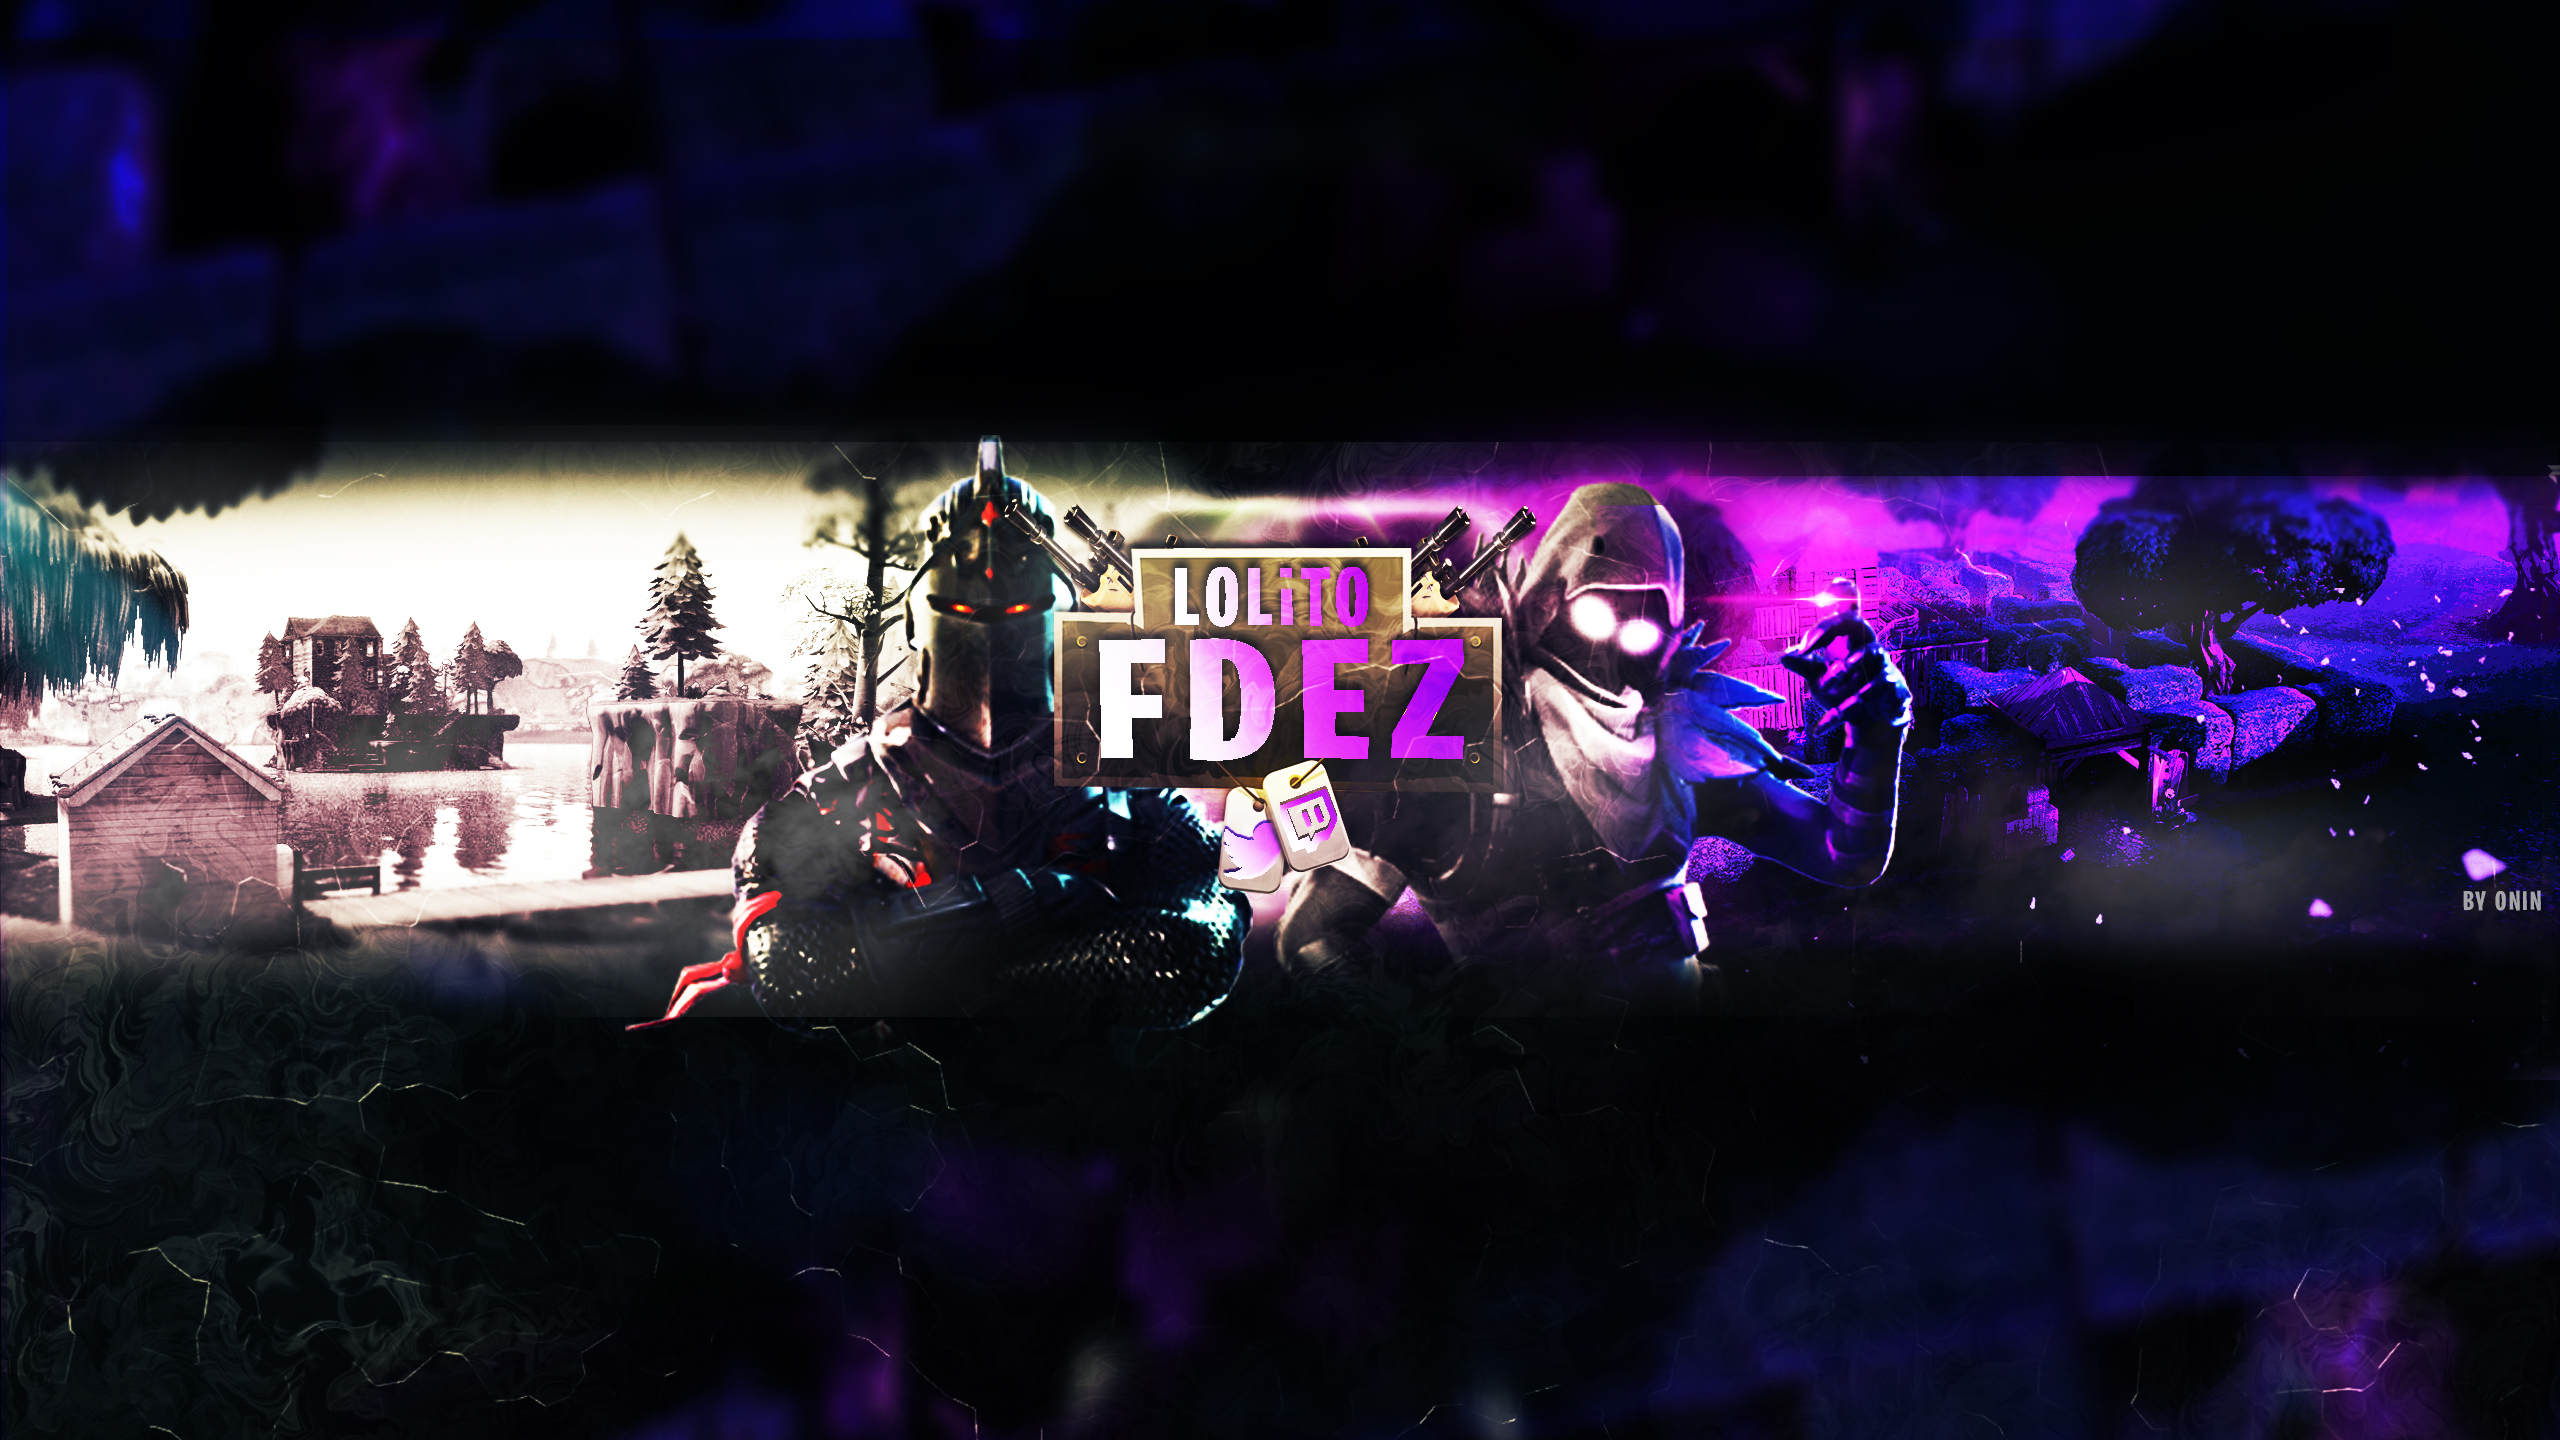 Fortnite Youtube Banner For Lolito Fdez 2nd Ver By Oninyourfly On Deviantart